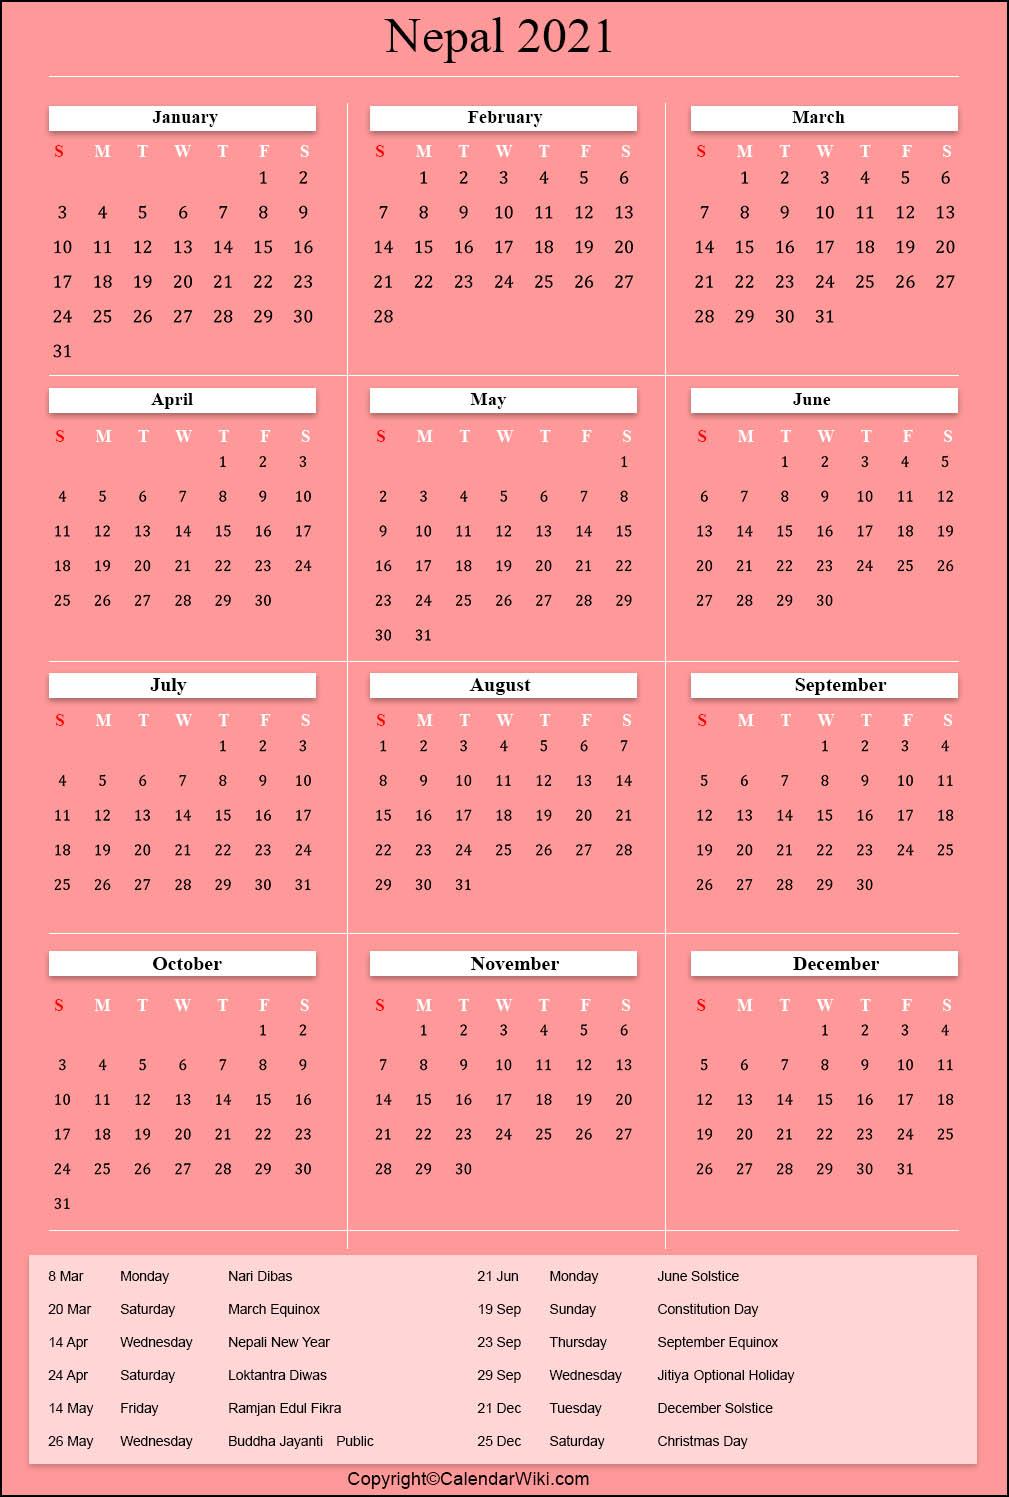 Nepali Calendar 2022.Printable Nepal Calendar 2021 With Holidays Public Holidays